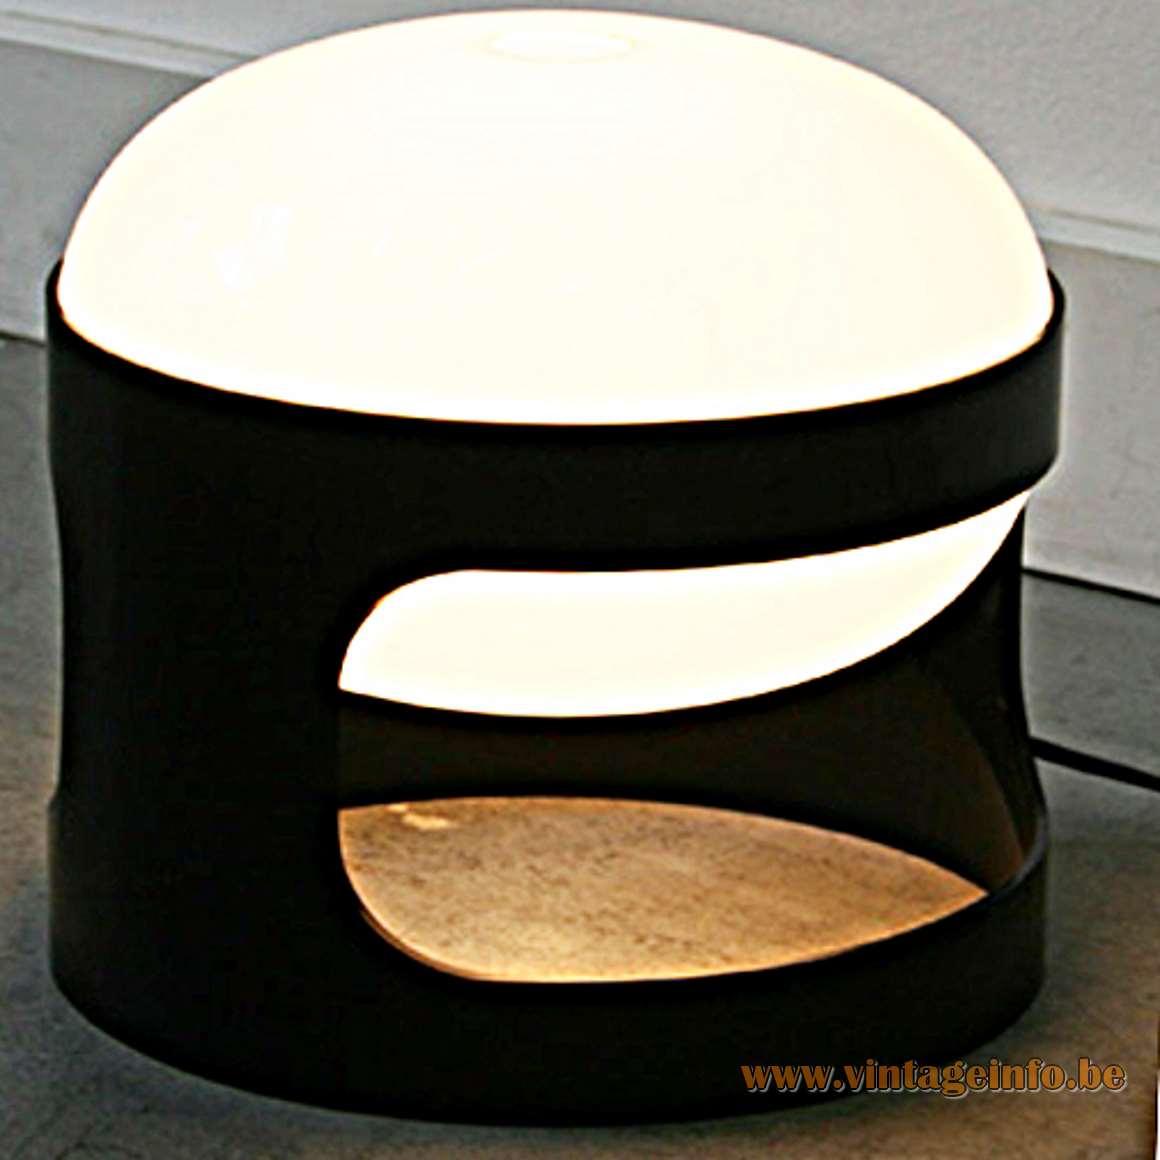 Joe Colombo KD27 Kartell Table Lamp - black